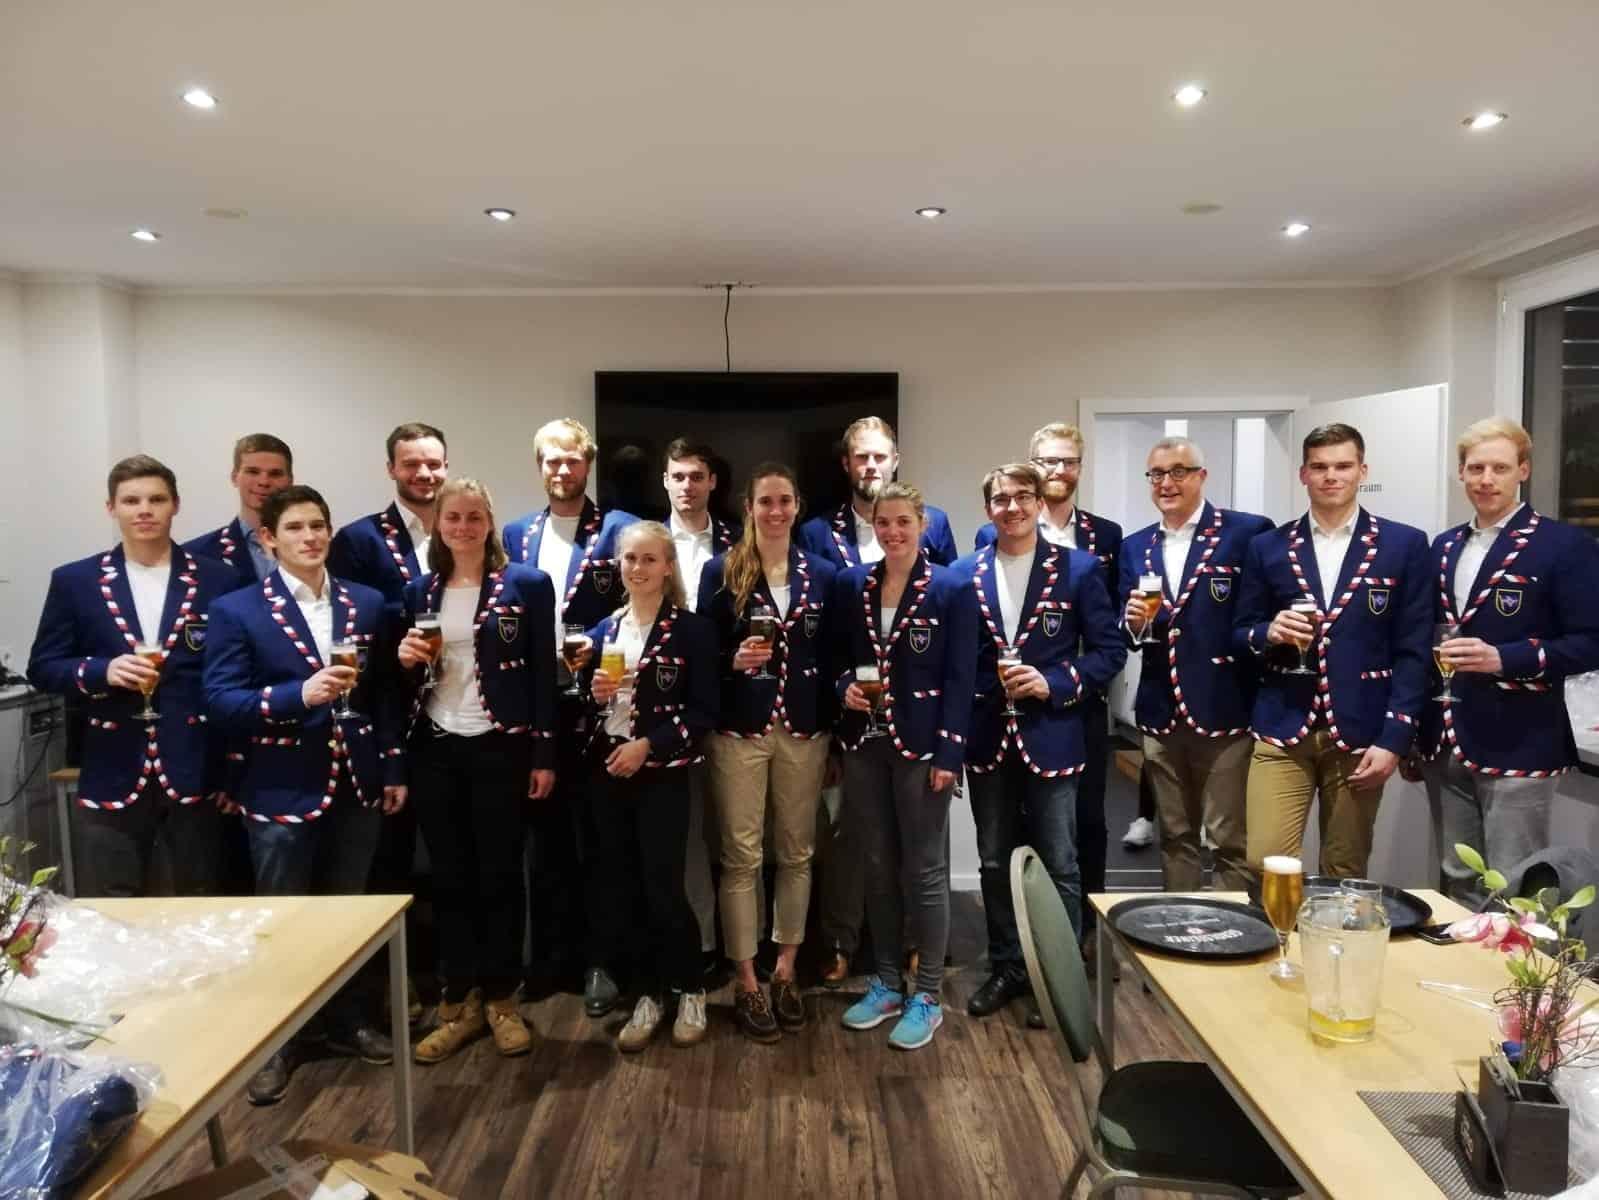 Club Blazers for the Hendrick Hellhammer Rowing Club - Club